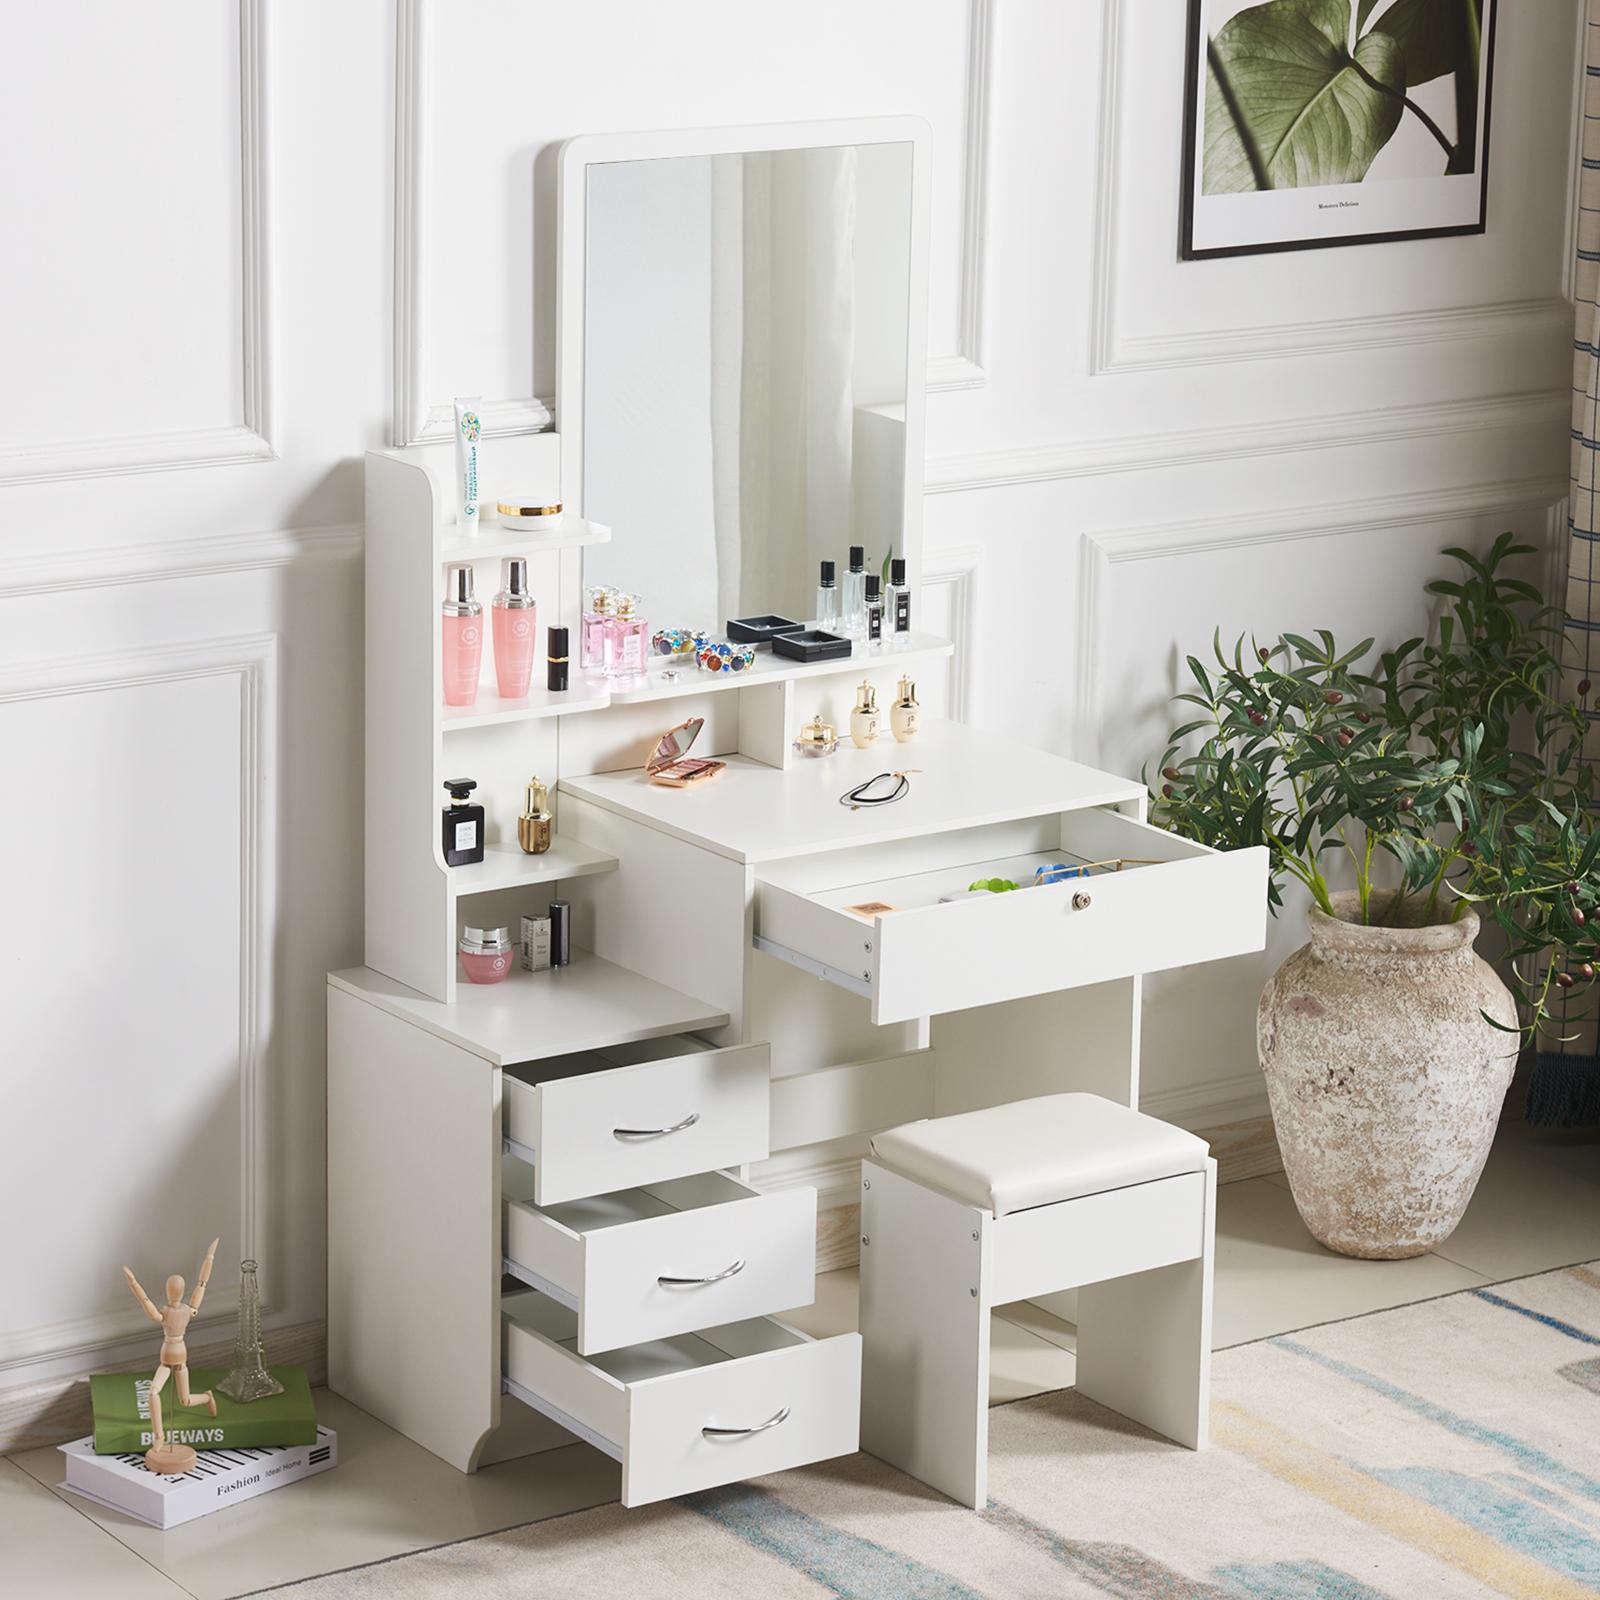 Modern White Dressing Table Jewelry Makeup Desk W Mirror Stool Set 4 Drawers 711639638662 Ebay